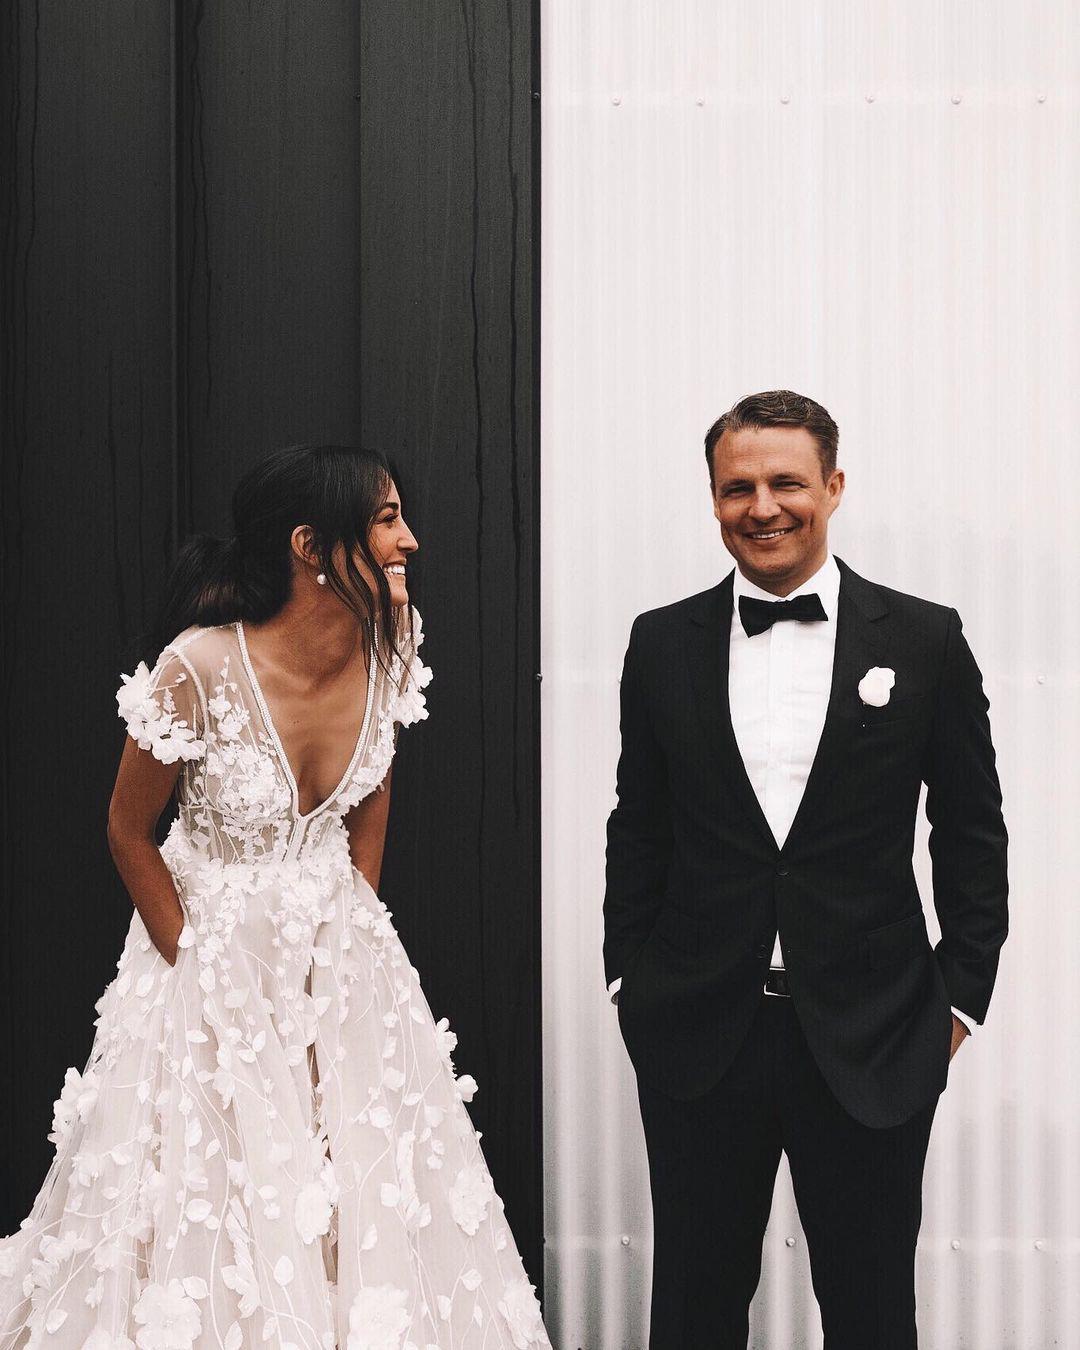 2020 fave wedding dresses